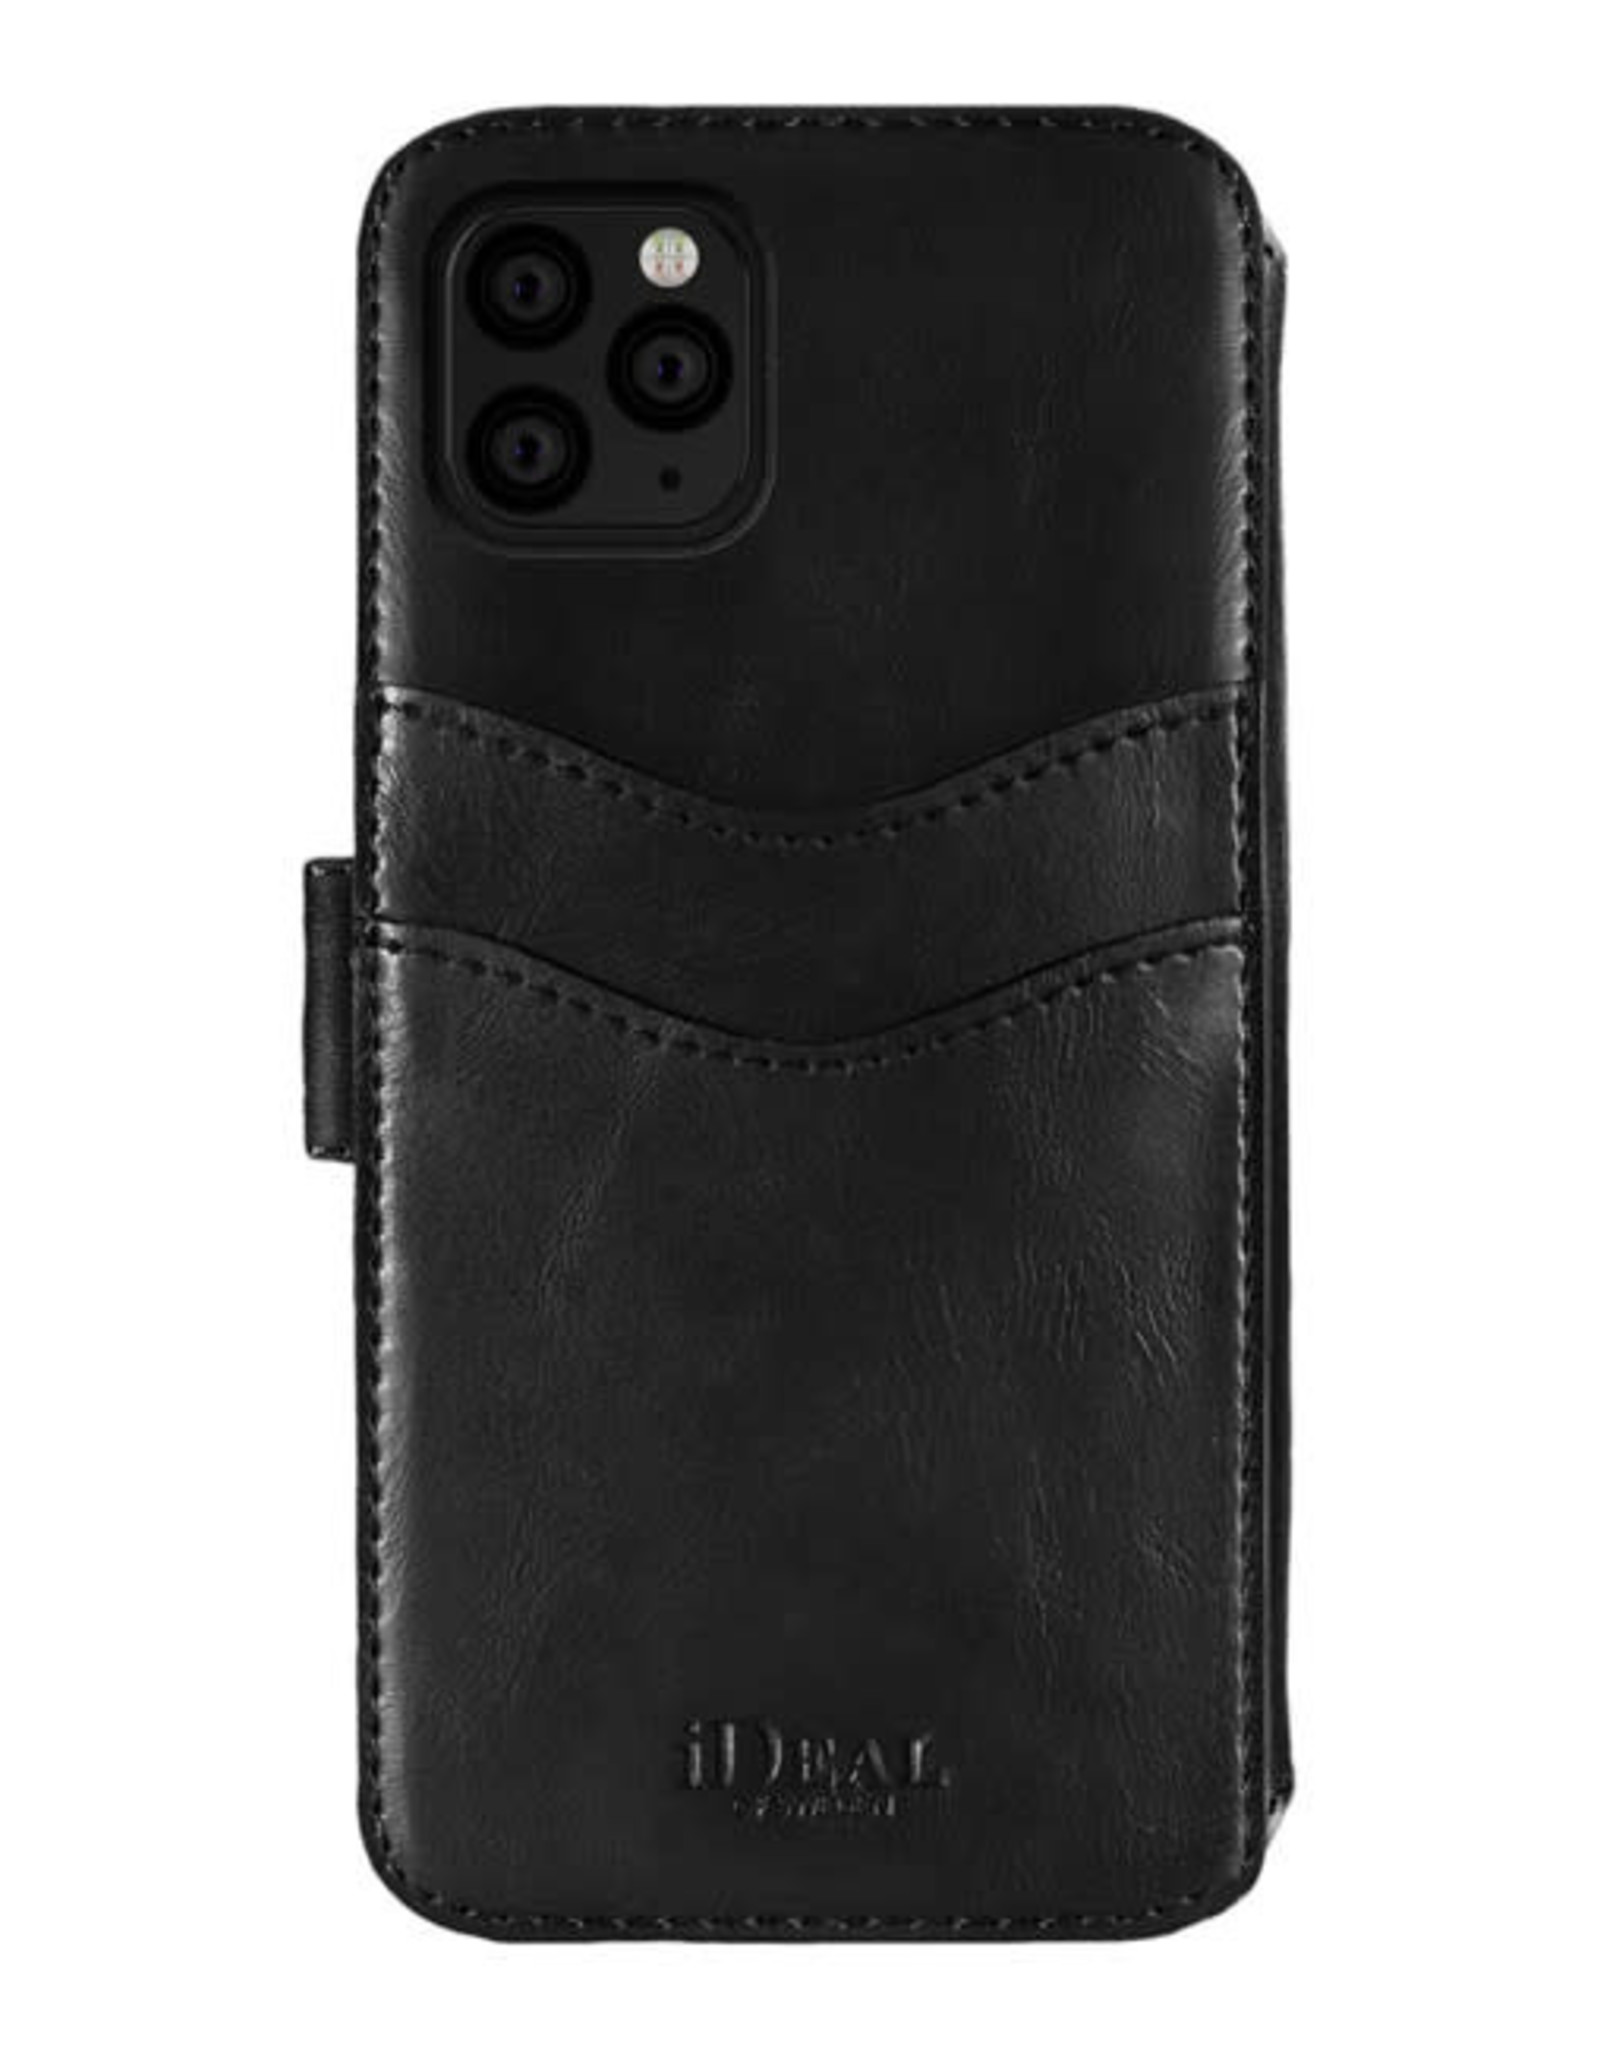 Ideal of Sweden STHLM Wallet iPhone 12 mini Black